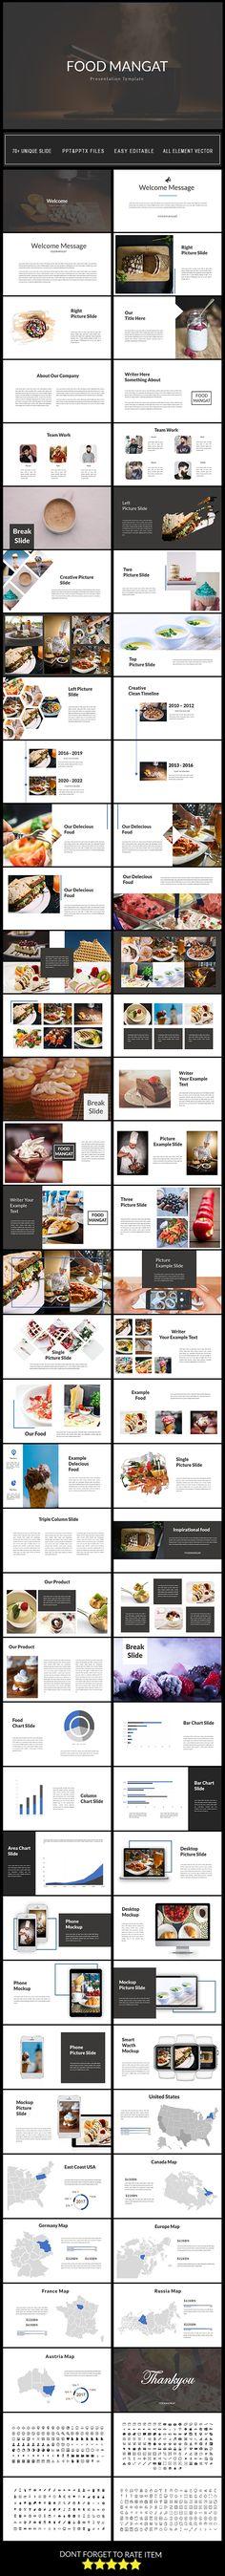 Food Mangat Powerpoint Presentation Template